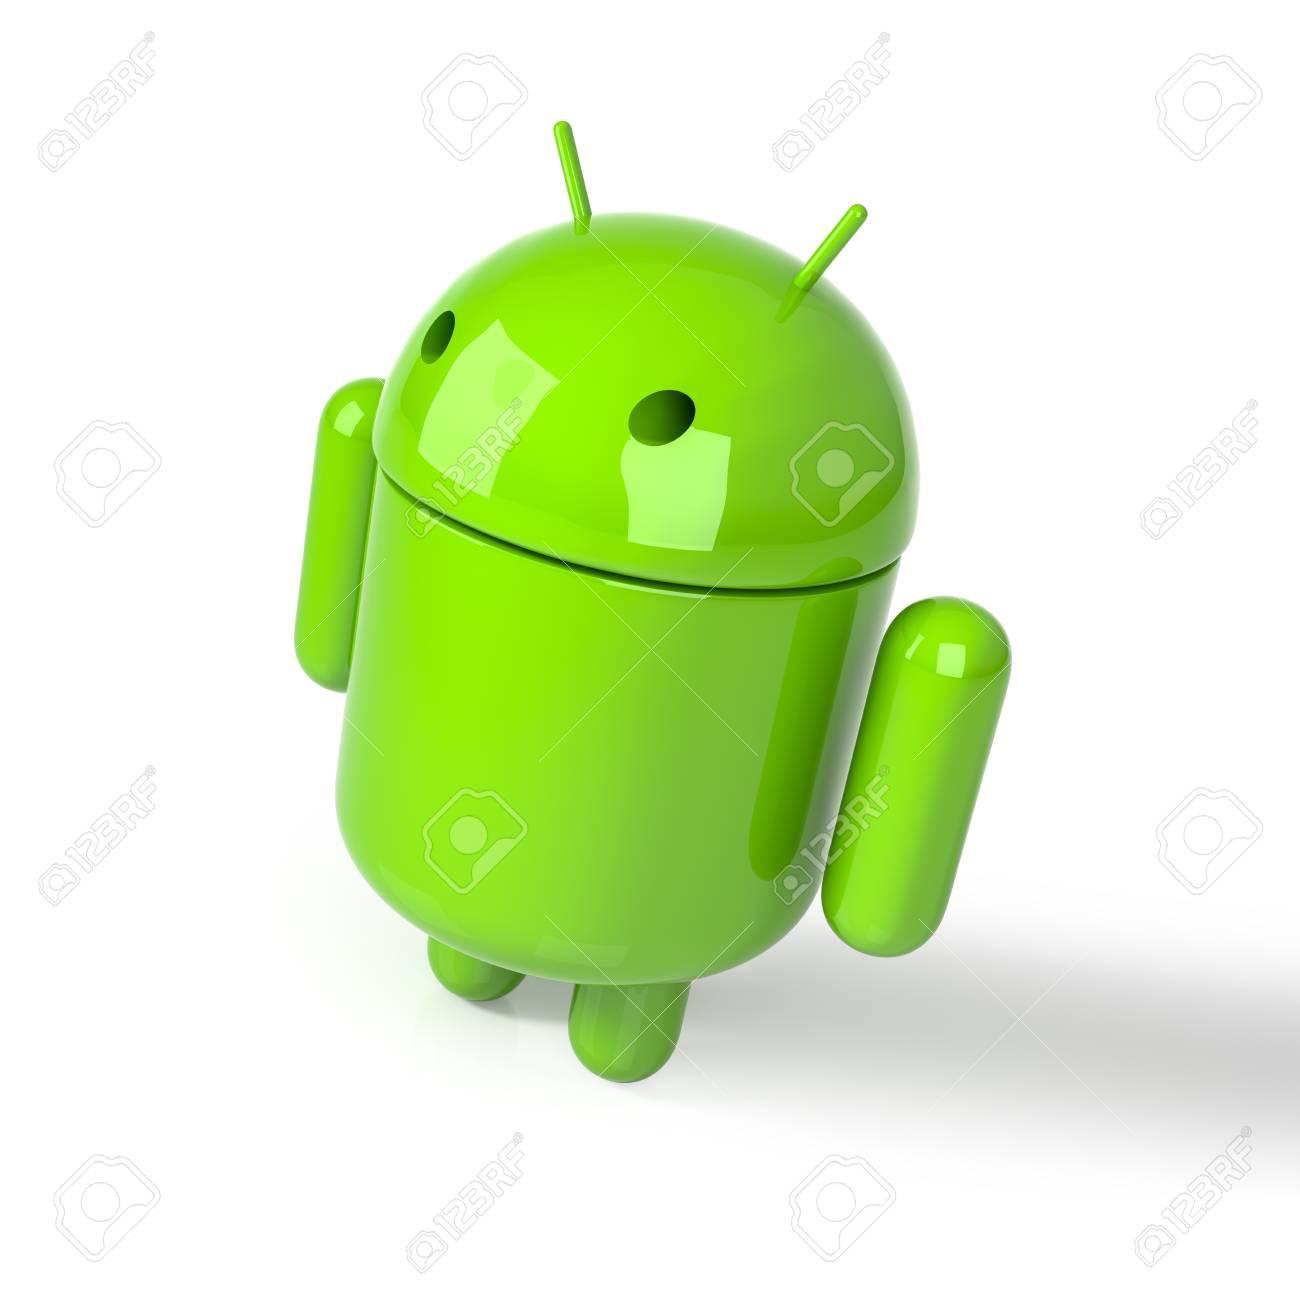 Izmir Turkey December 13 2017 Android Symbol Figure On Stock